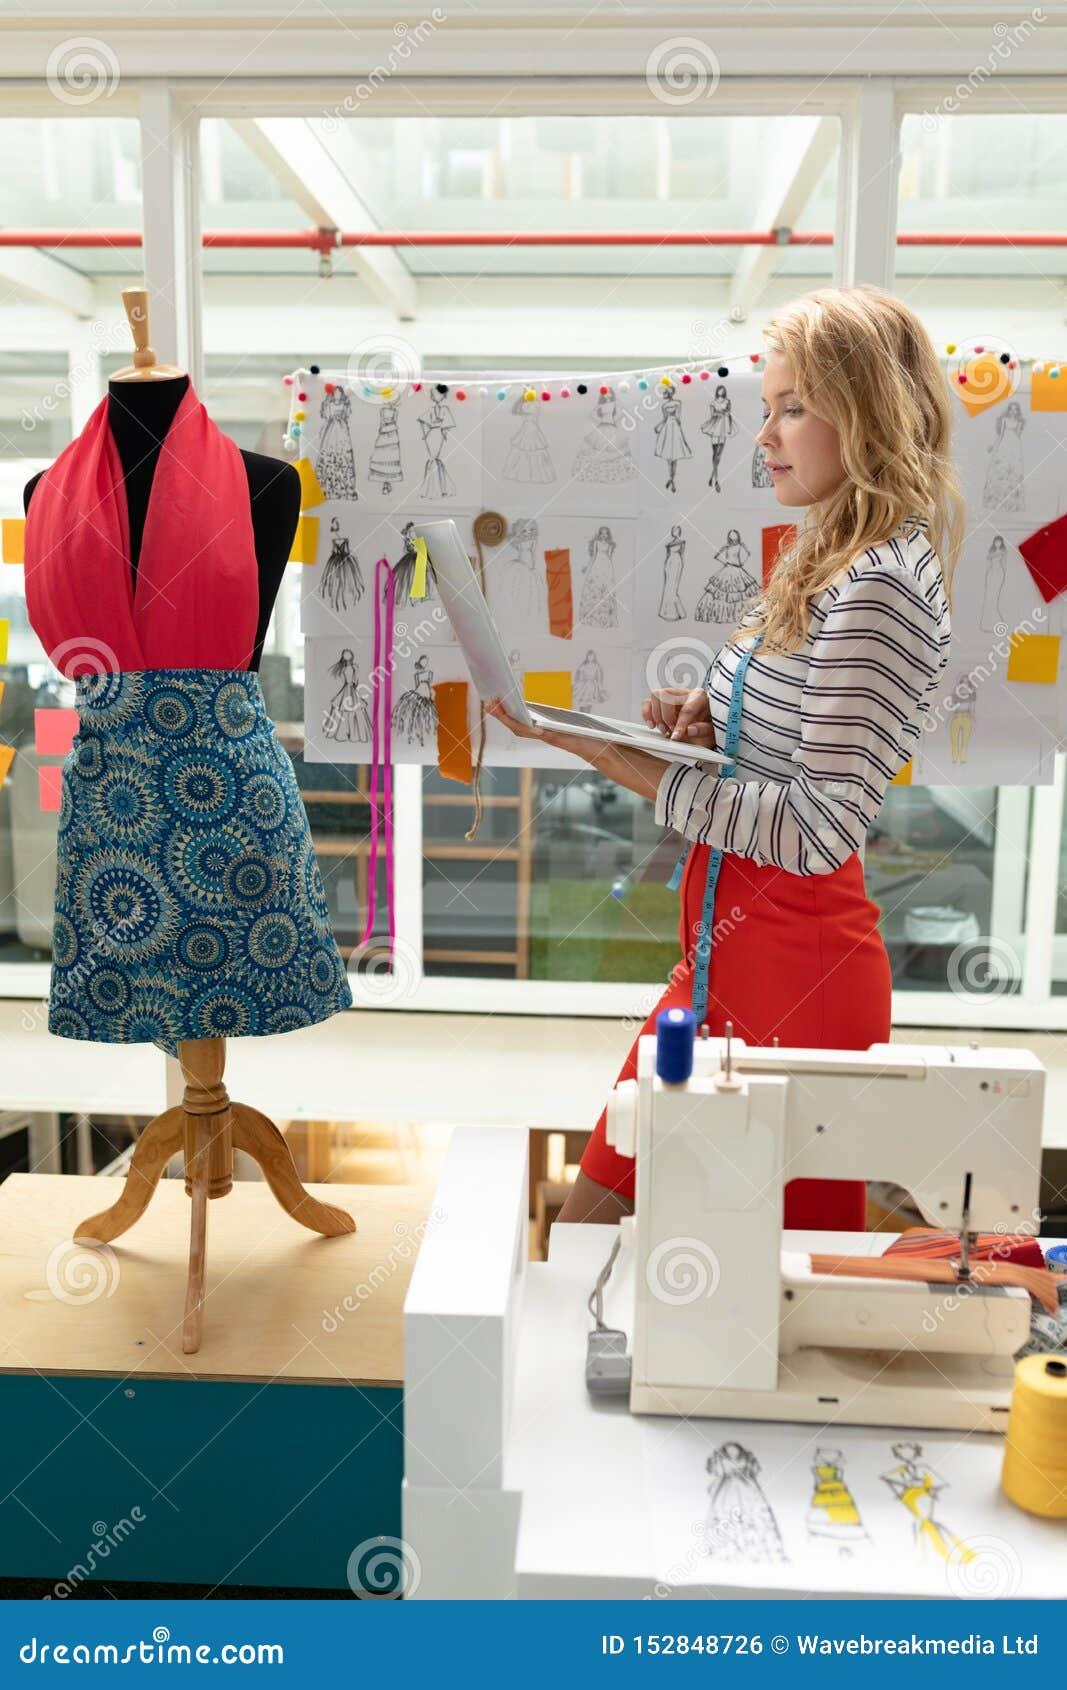 Female Fashion Designer Using Laptop In Design Studio Stock Photo Image Of Caucasian Global 152848726